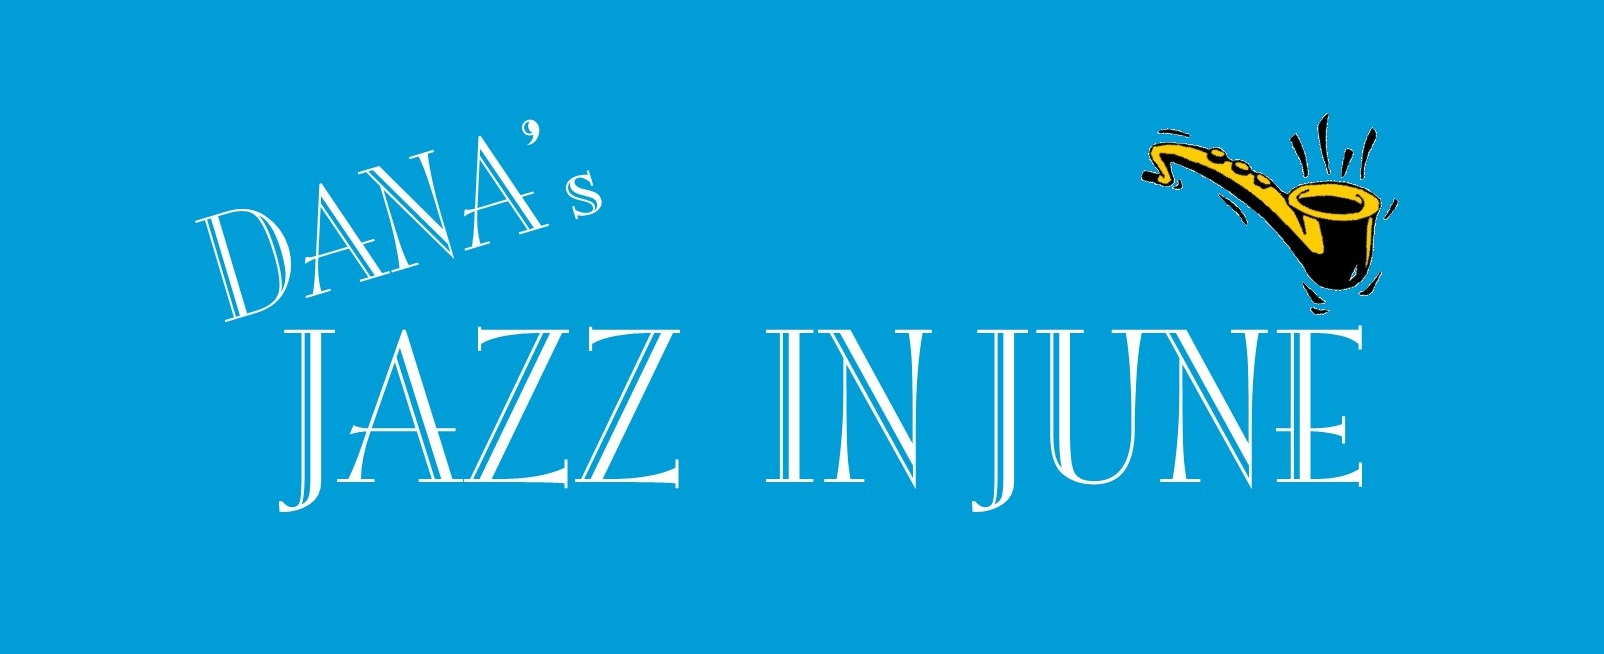 Jazz-title-narrow3